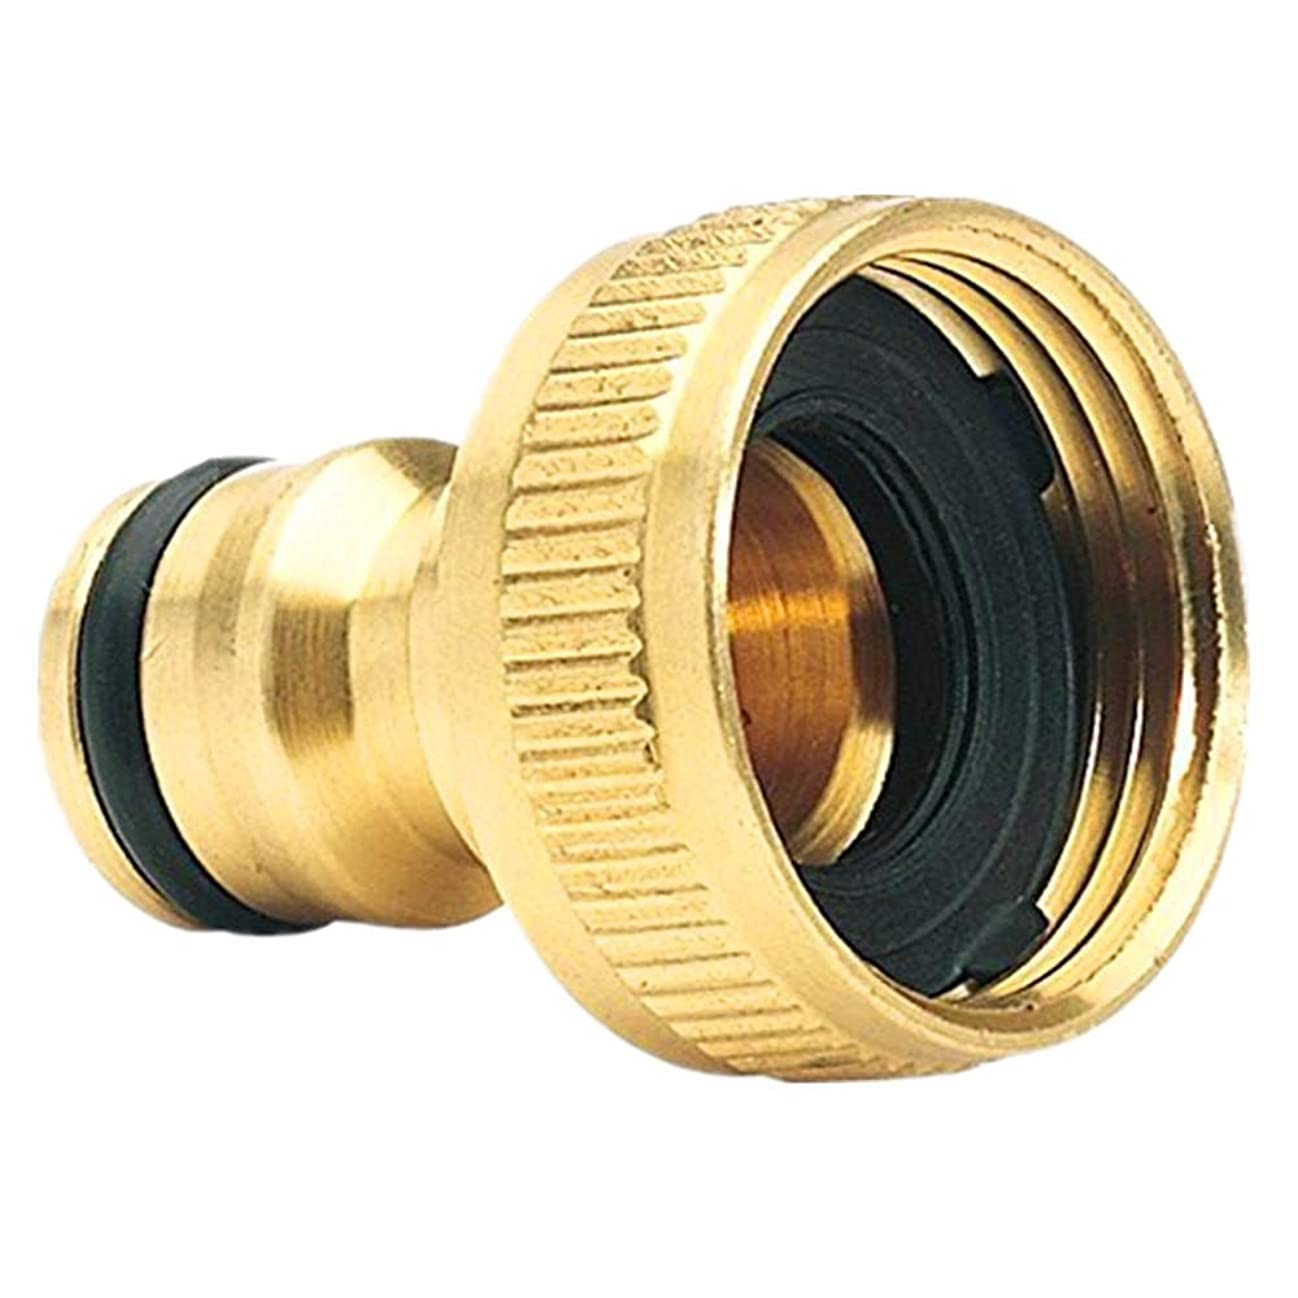 ? Yu2d ???? ?Brass Garden Hose Tap Connector (3/4) Quick Hose Adaptor Accessories hudmq694753